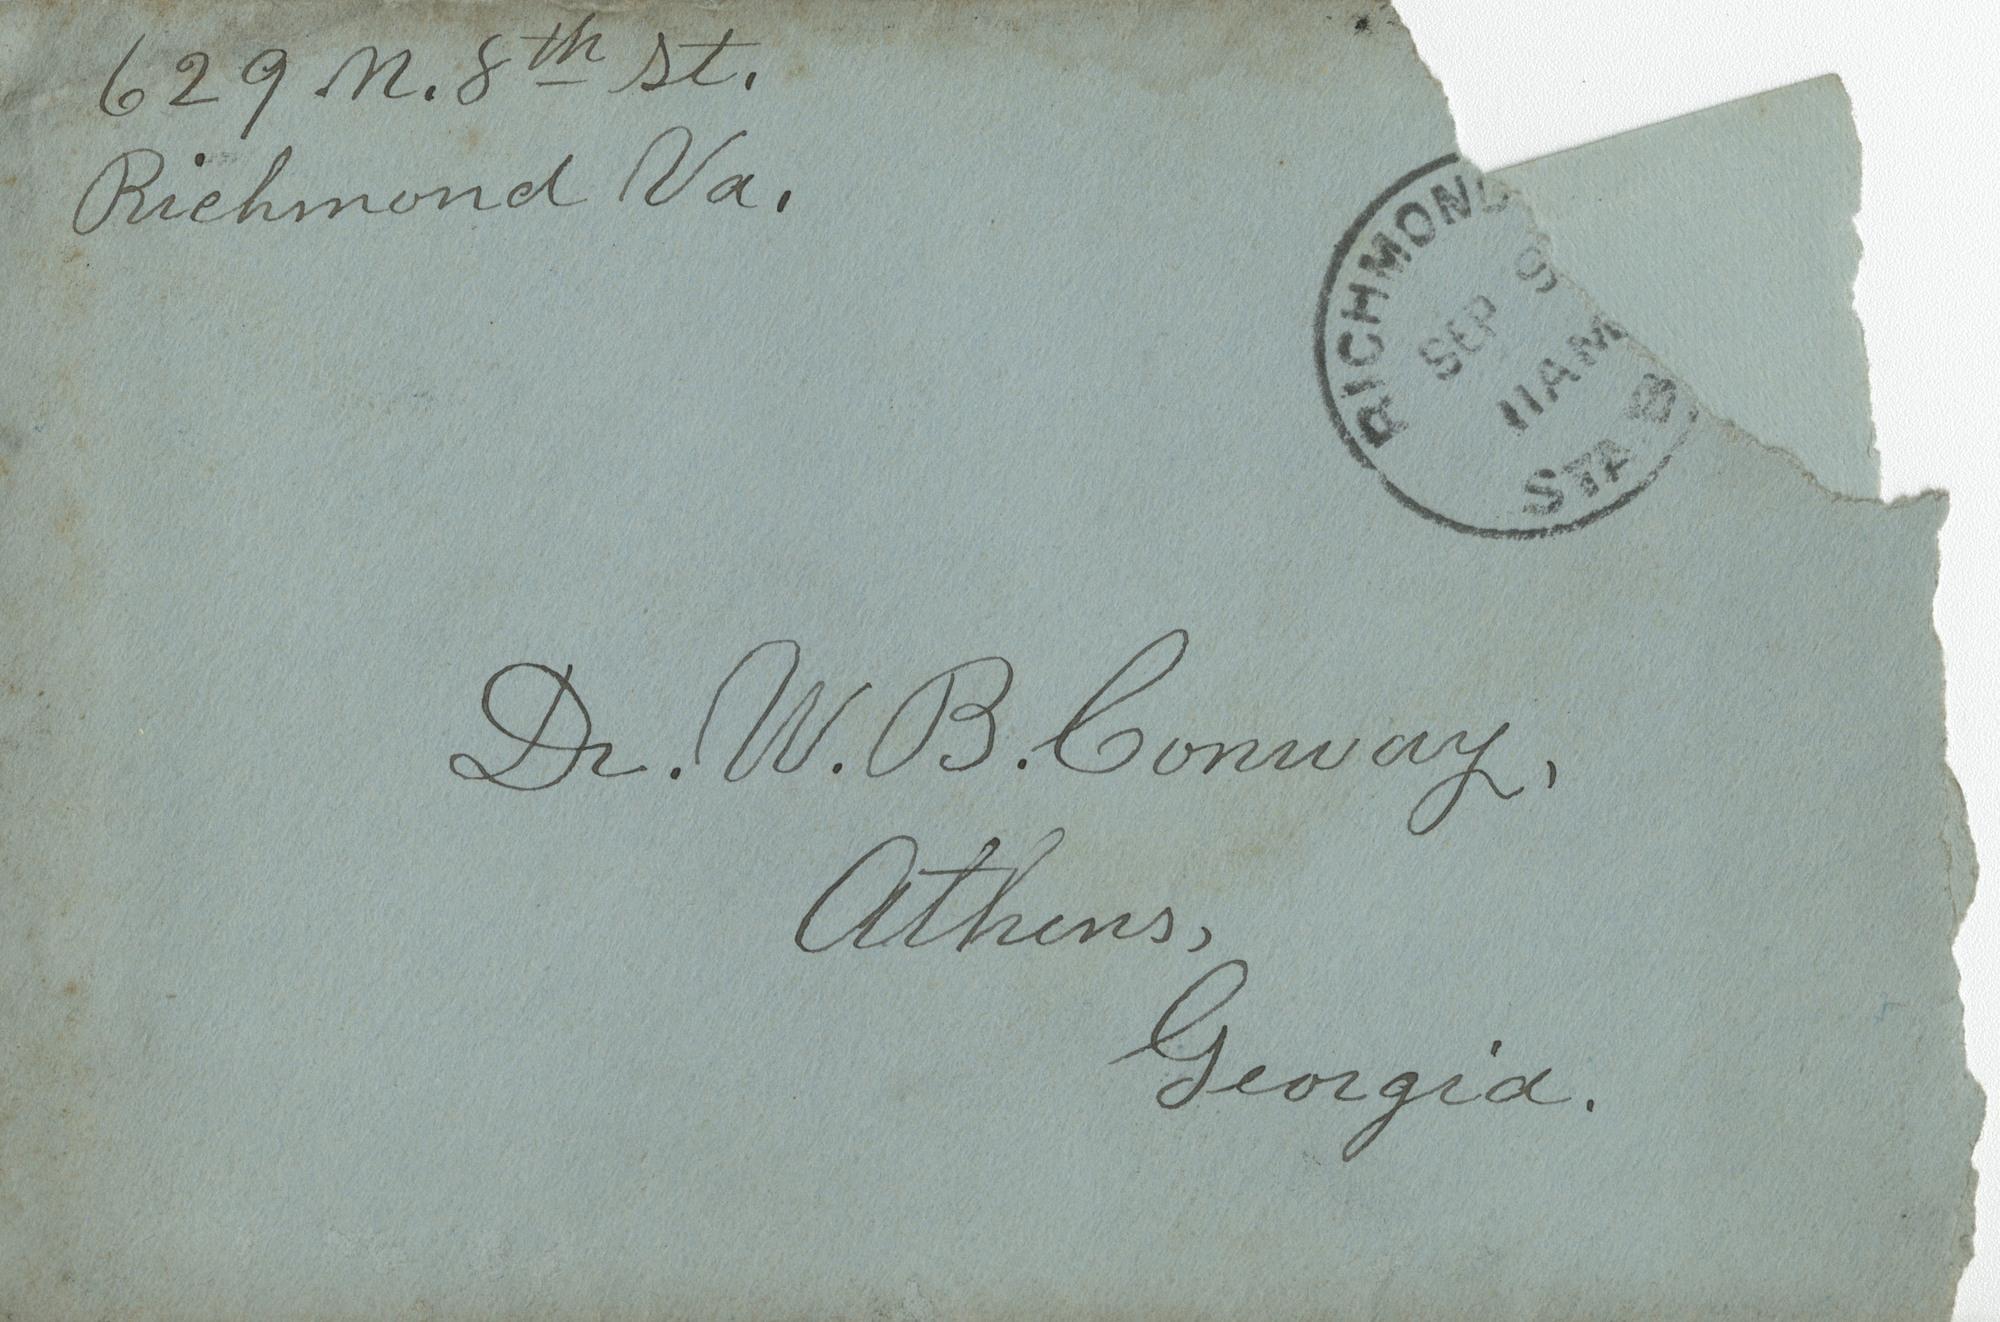 http://spec.lib.vt.edu/pickup/Omeka_upload/Ms2012-039_ConwayCatlett_F3_Letter_1901_0908_enva.jpg